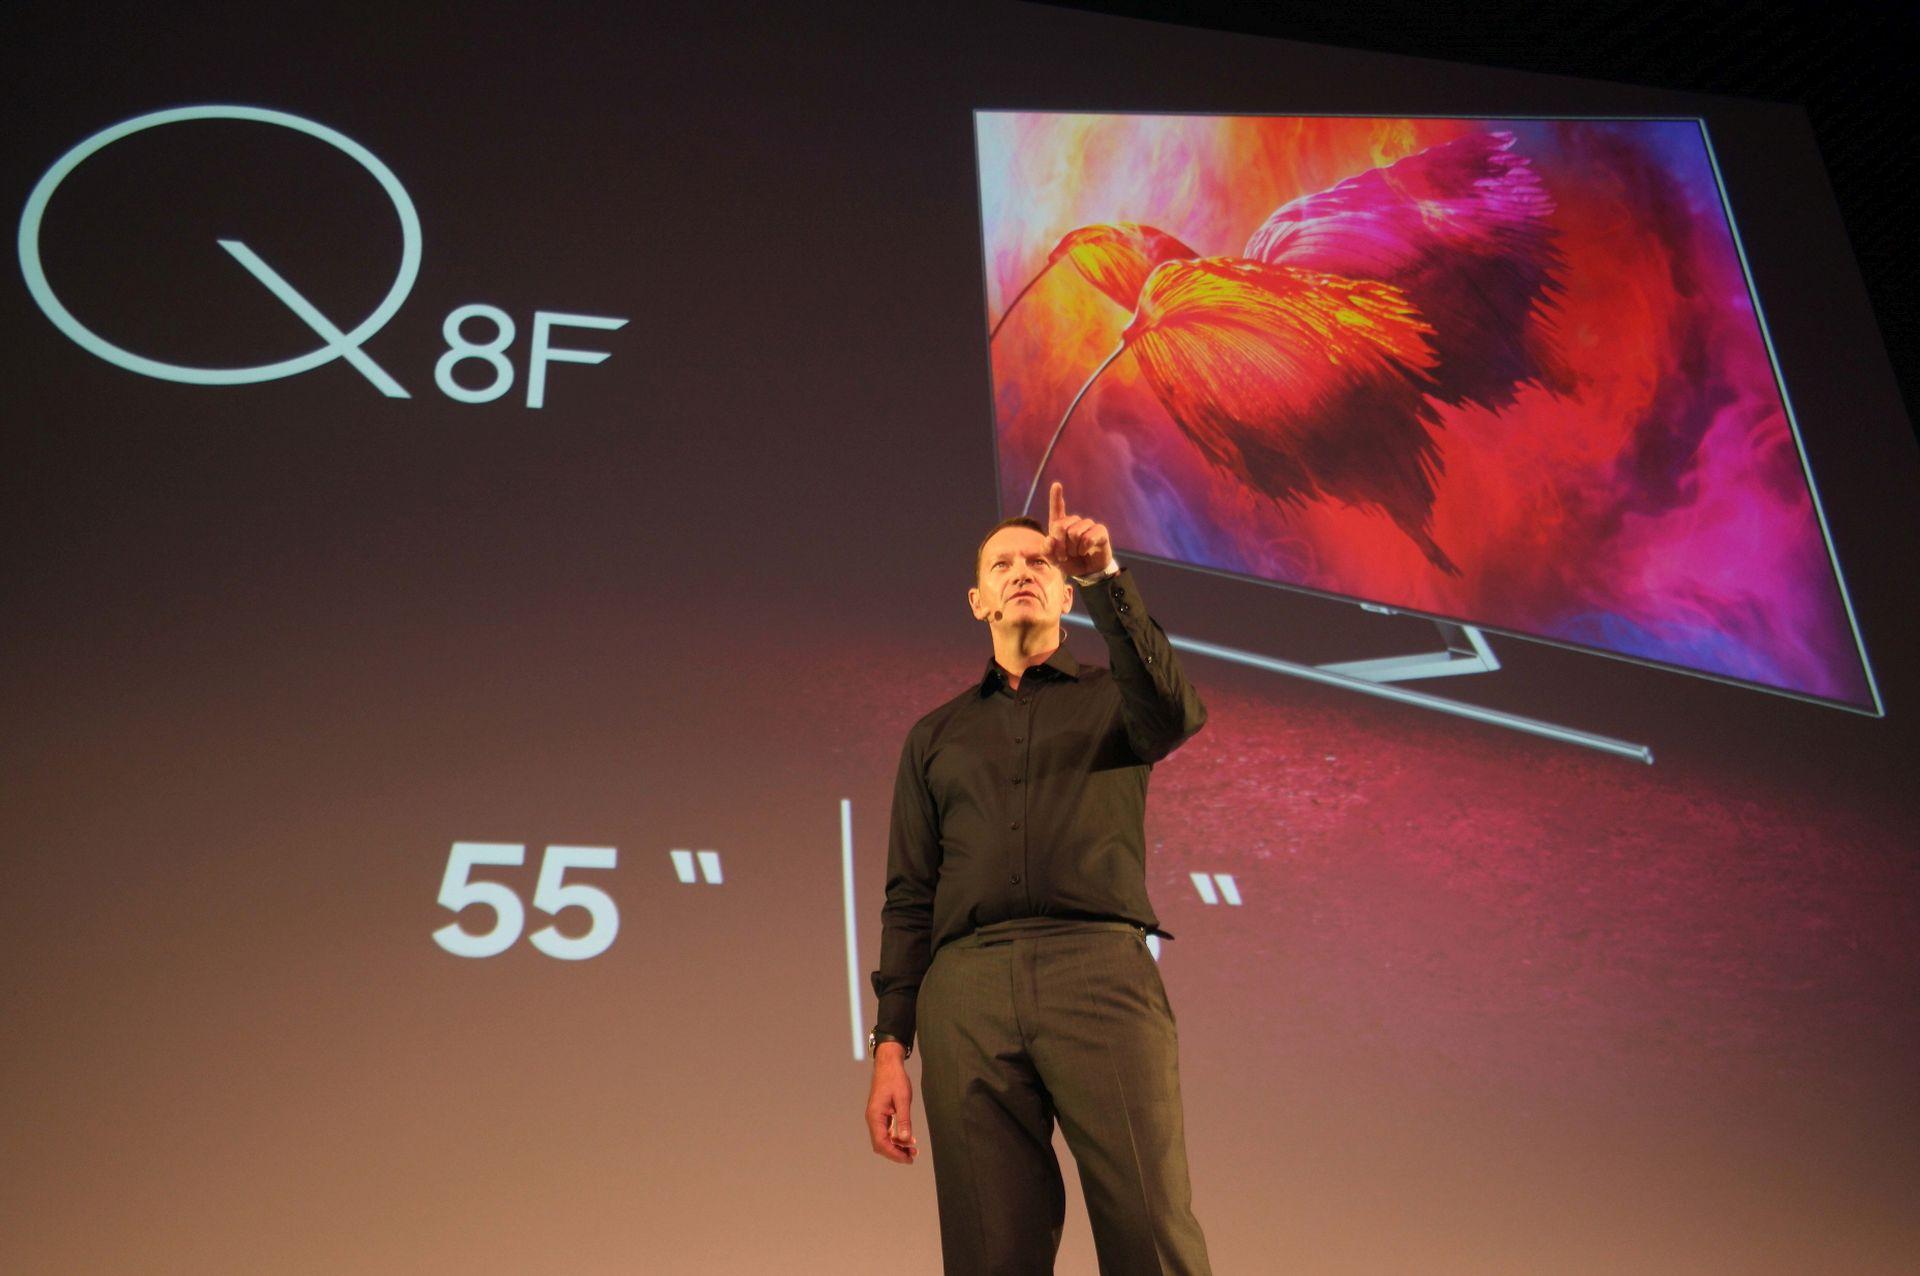 Photo of Noile produse anunțate de Samsung la IFA 2017